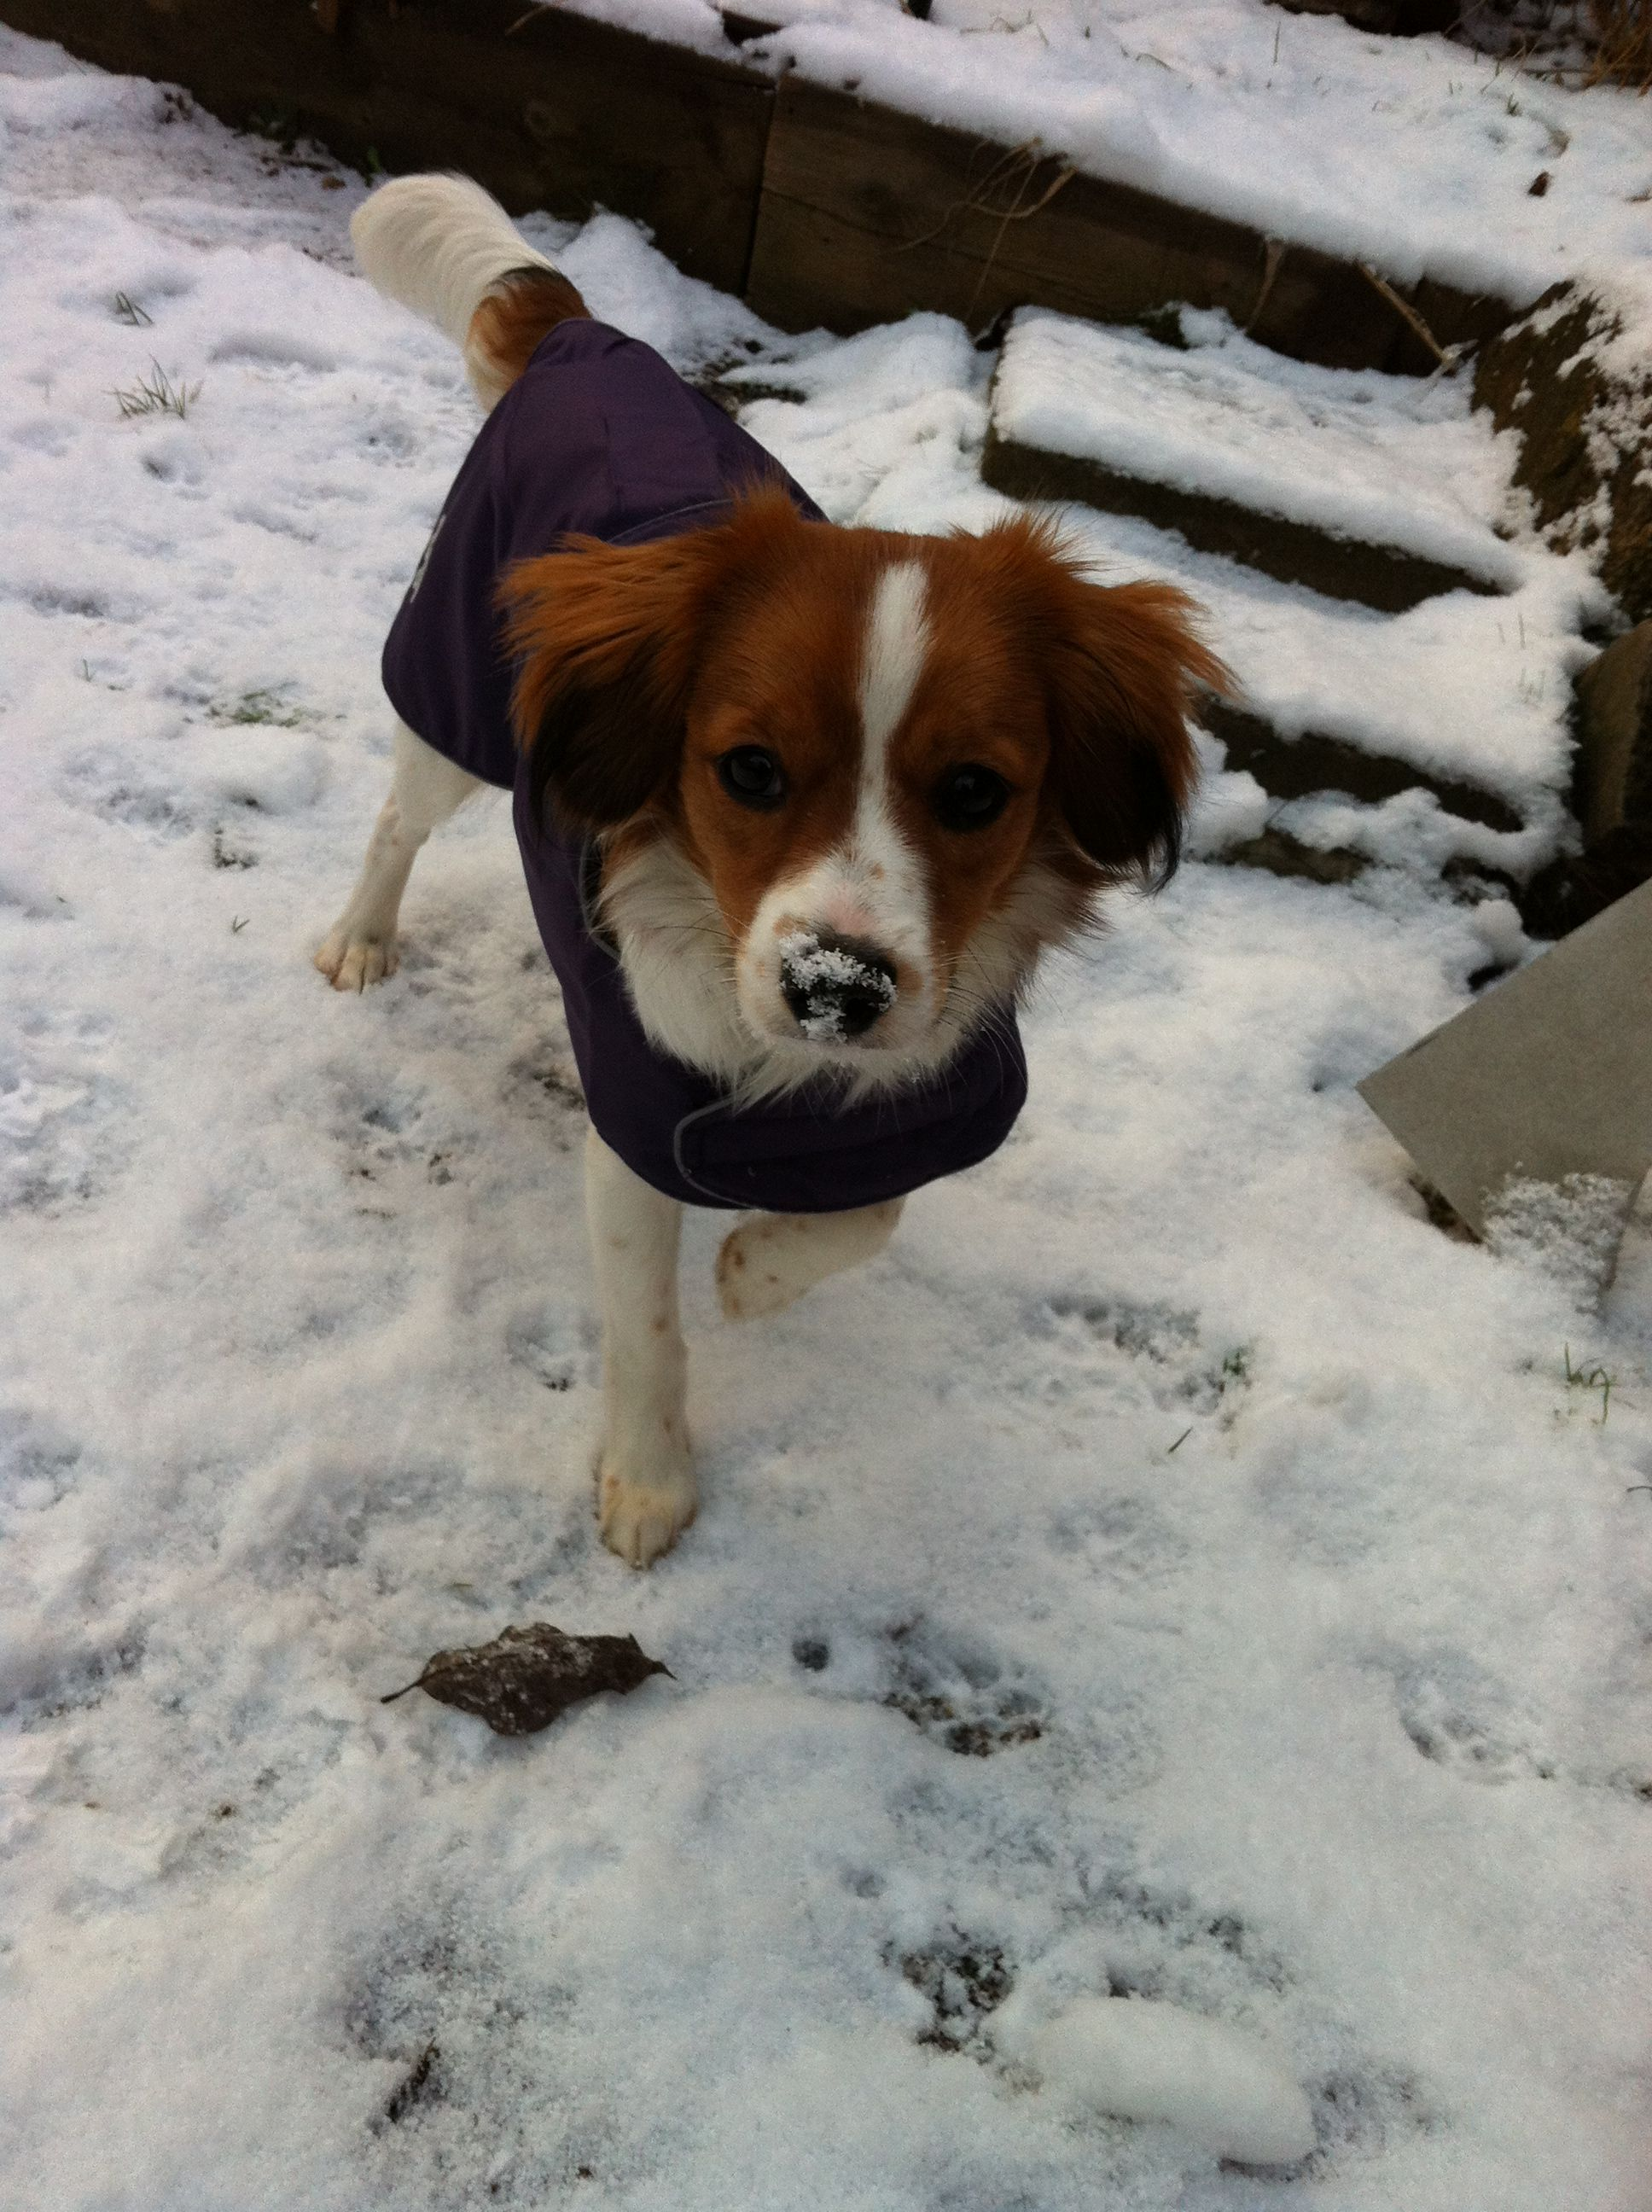 Kooikerhondje In Snow Nike 7 Months Jack Russell Teacup Pomeranian Corgi